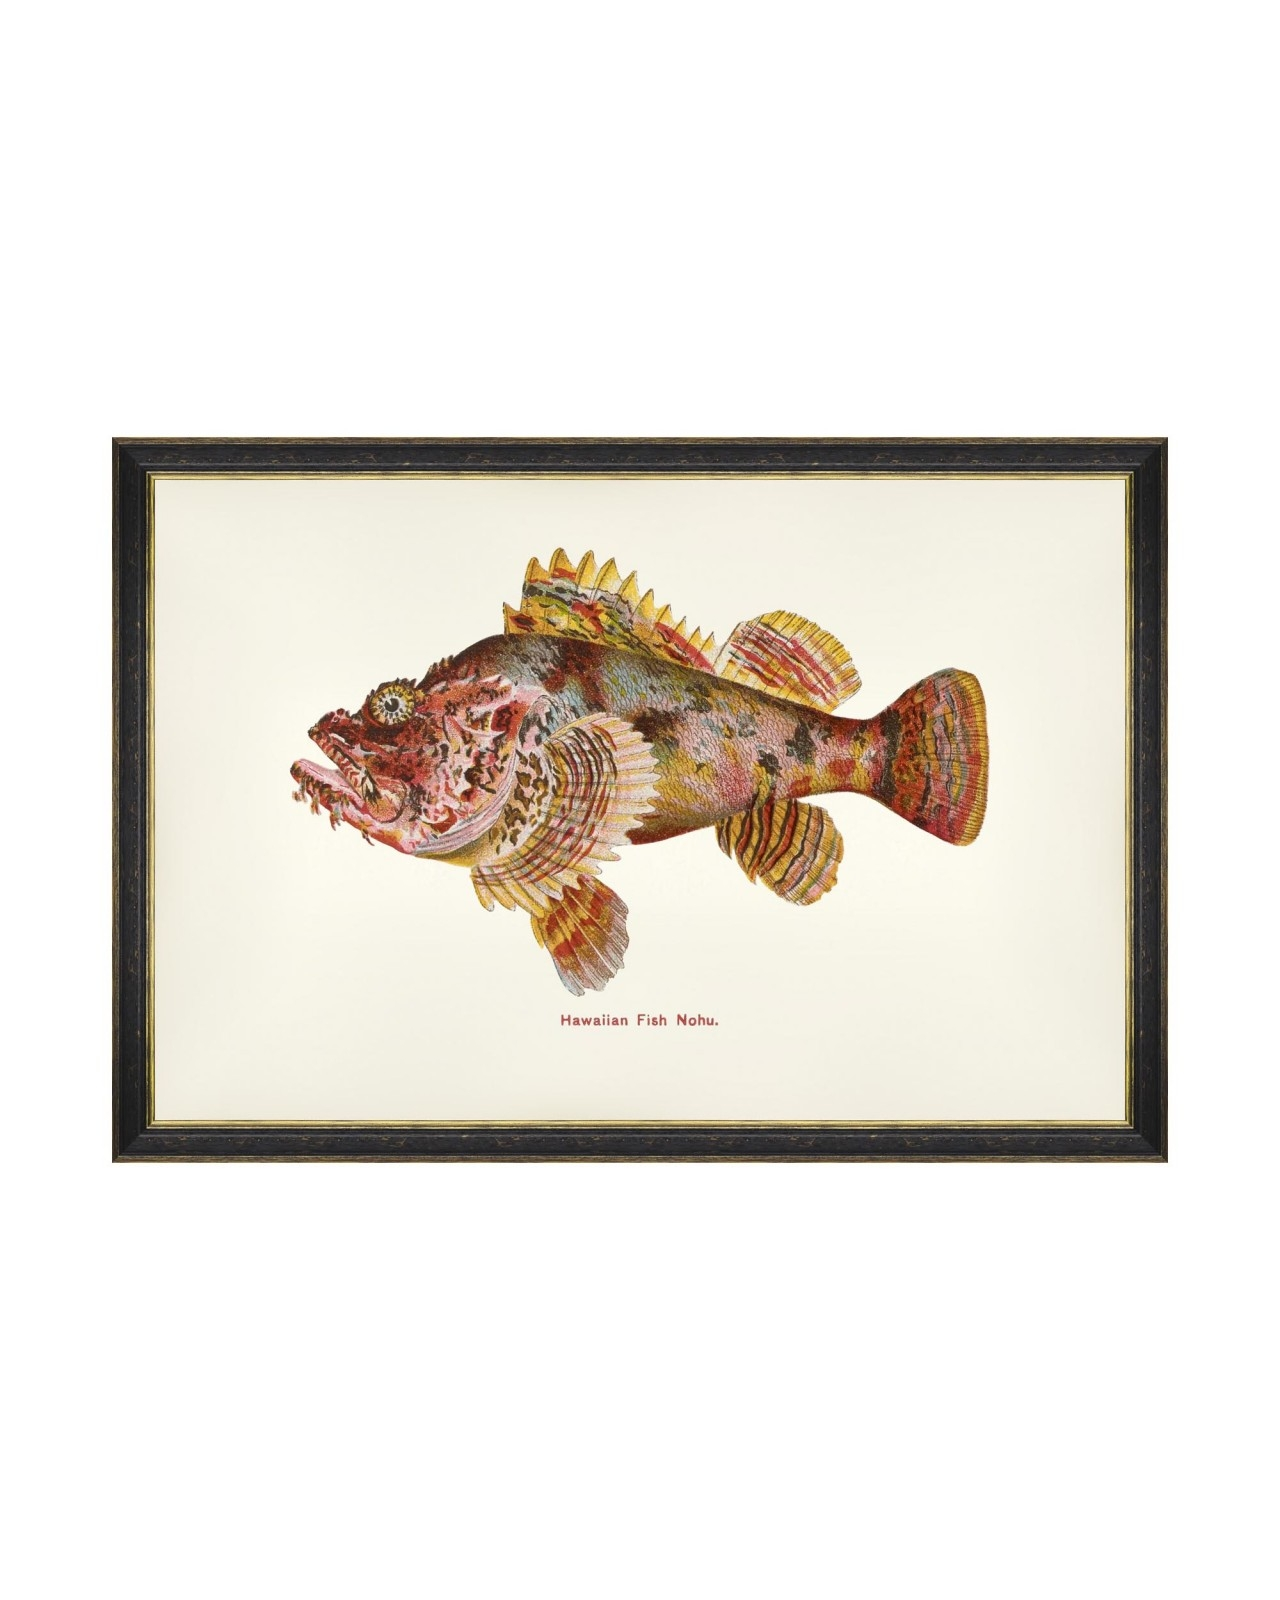 Tablou Framed Art Fishes Of Hawaii - Nohu Fish, 60 x 40 cm imagine